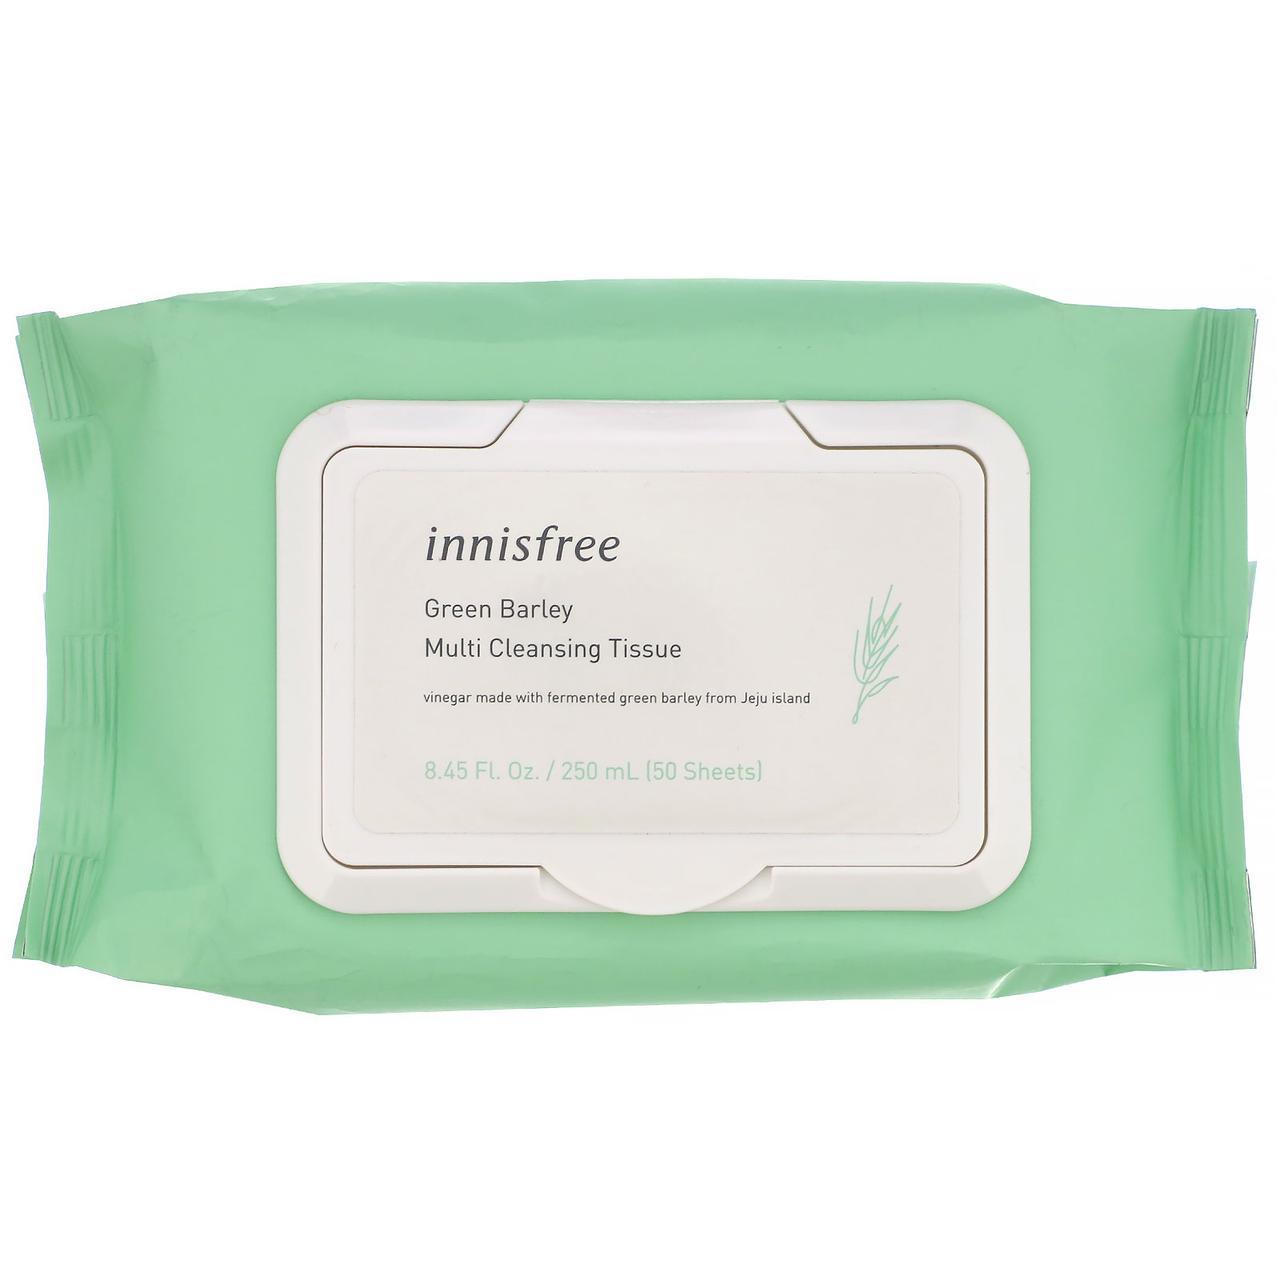 Innisfree Green Barley Multi Cleansing Tissue Универсальные очищающие салфетки, 50 шт